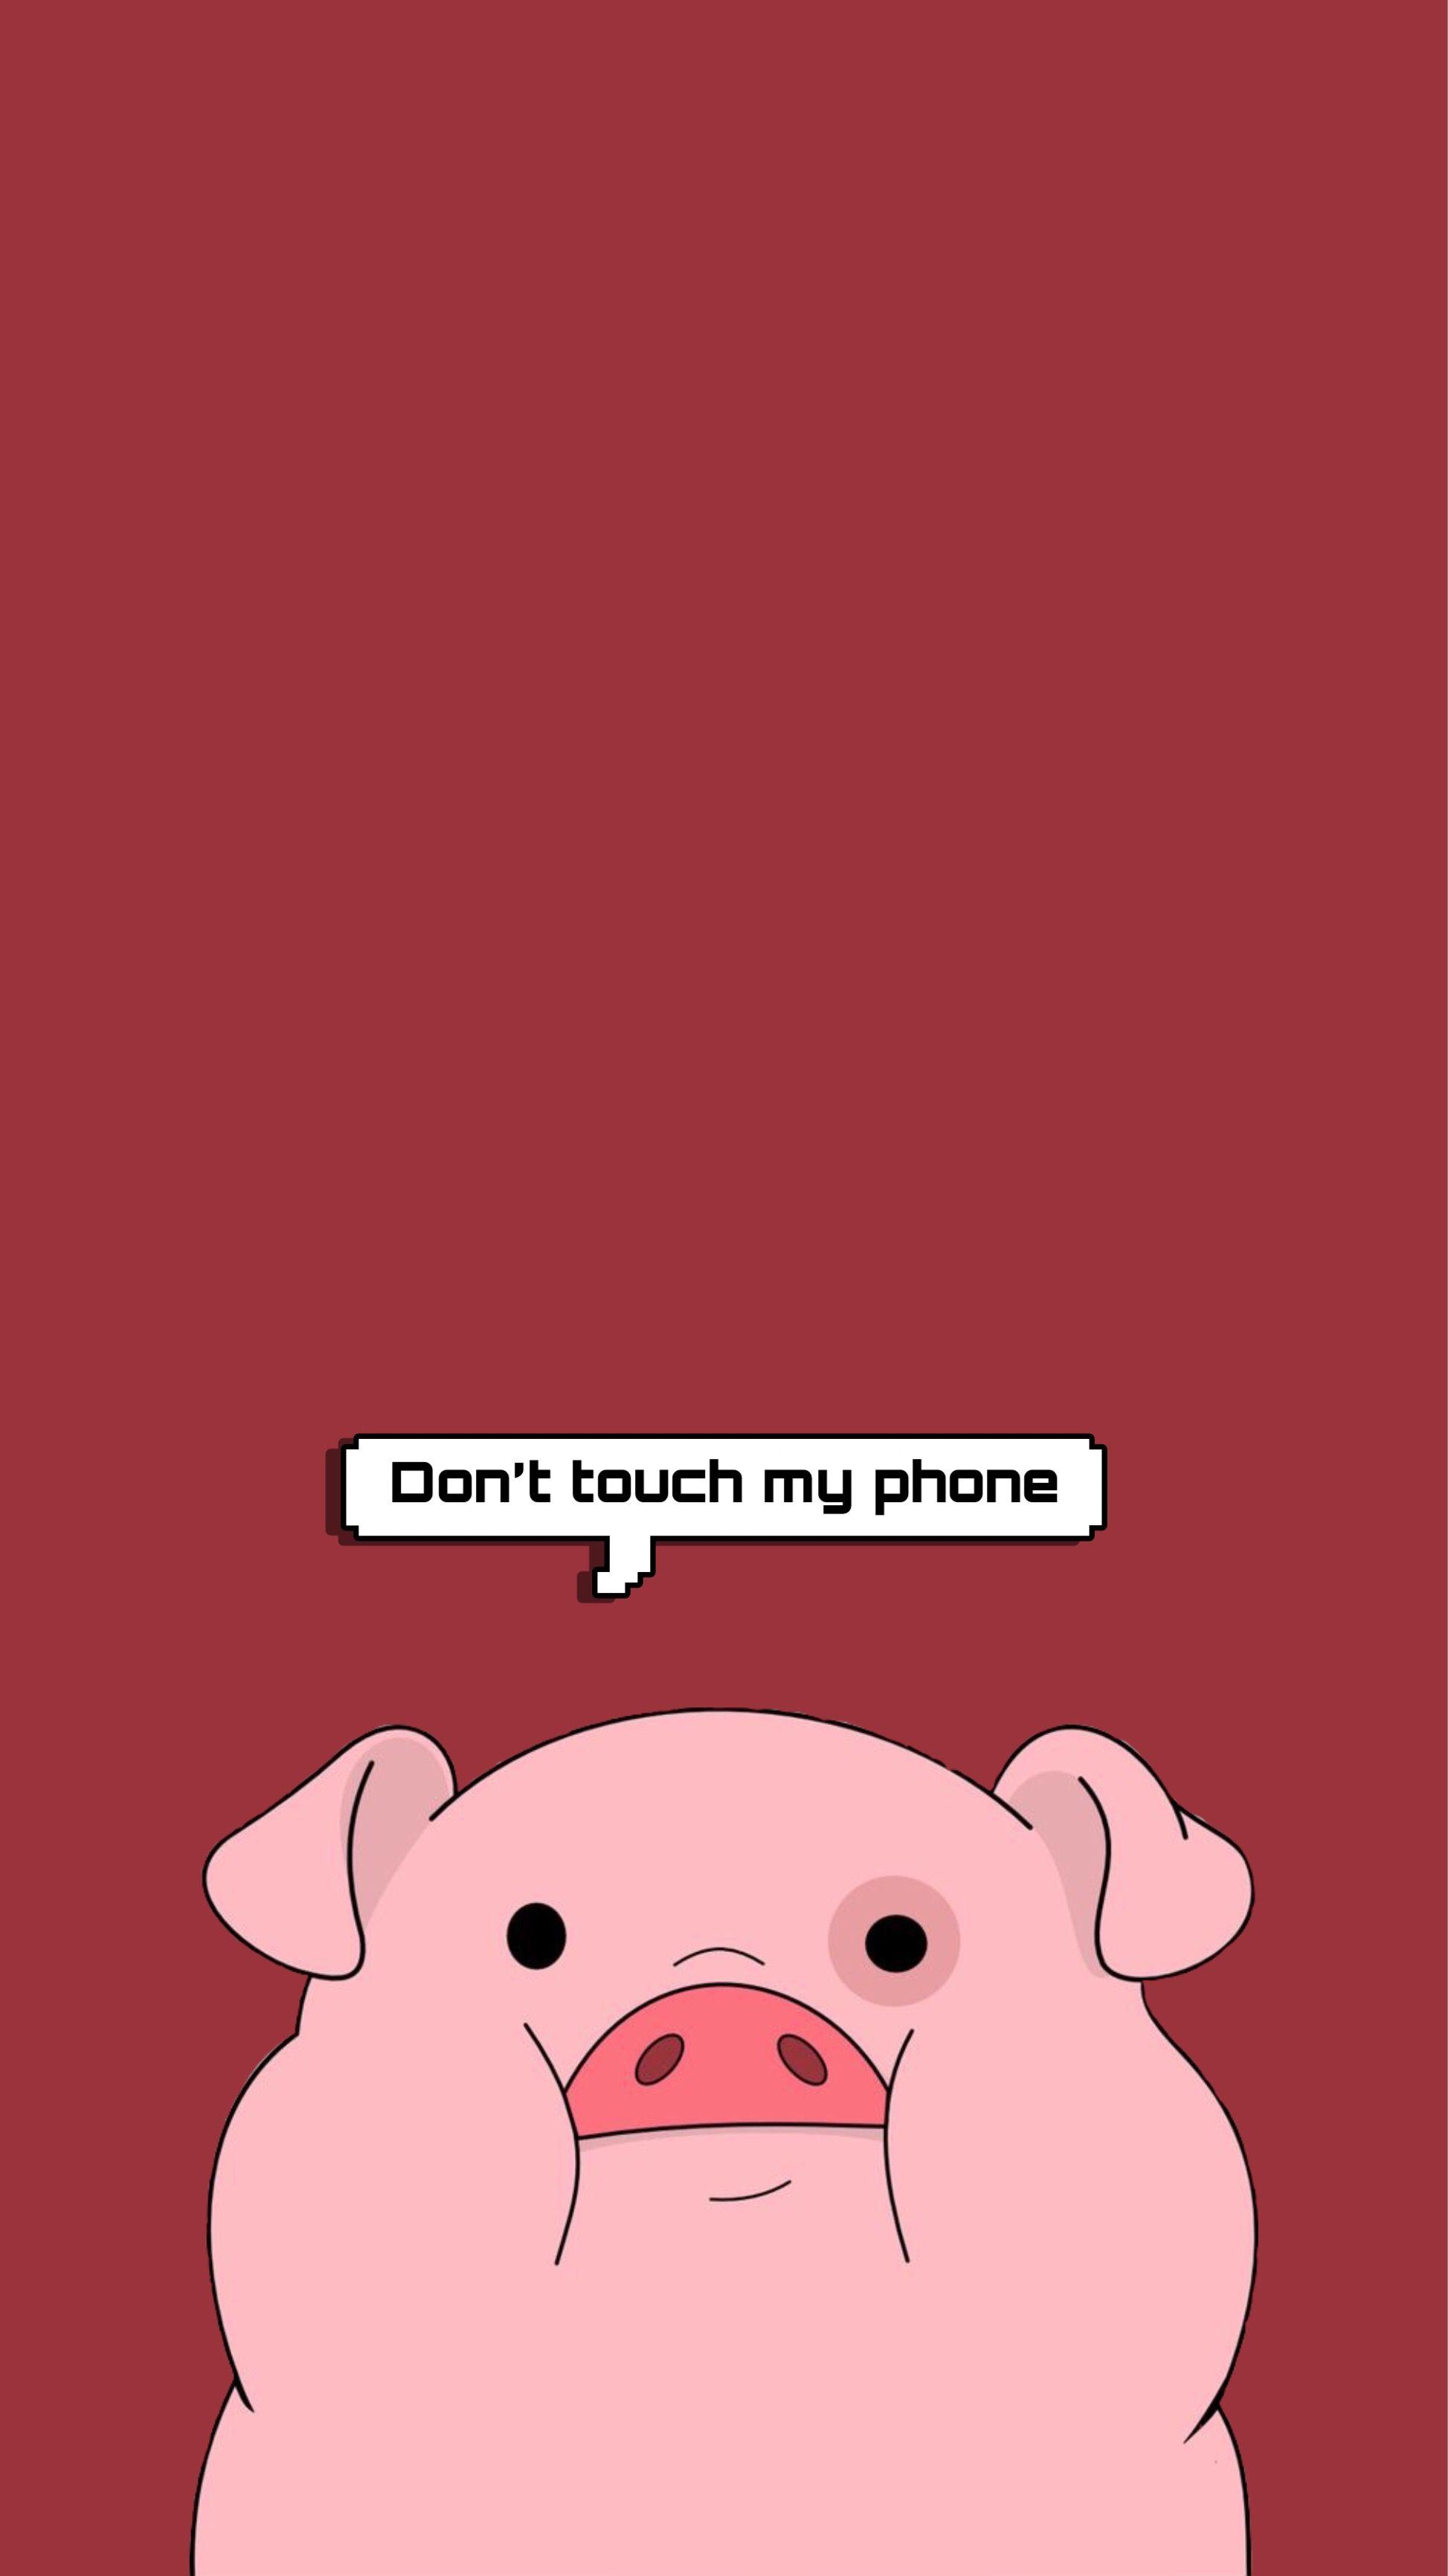 Pig Gravityfalls Wallpaper Iphone Wallpaper Quotes Funny Funny Iphone Wallpaper Funny Phone Wallpaper